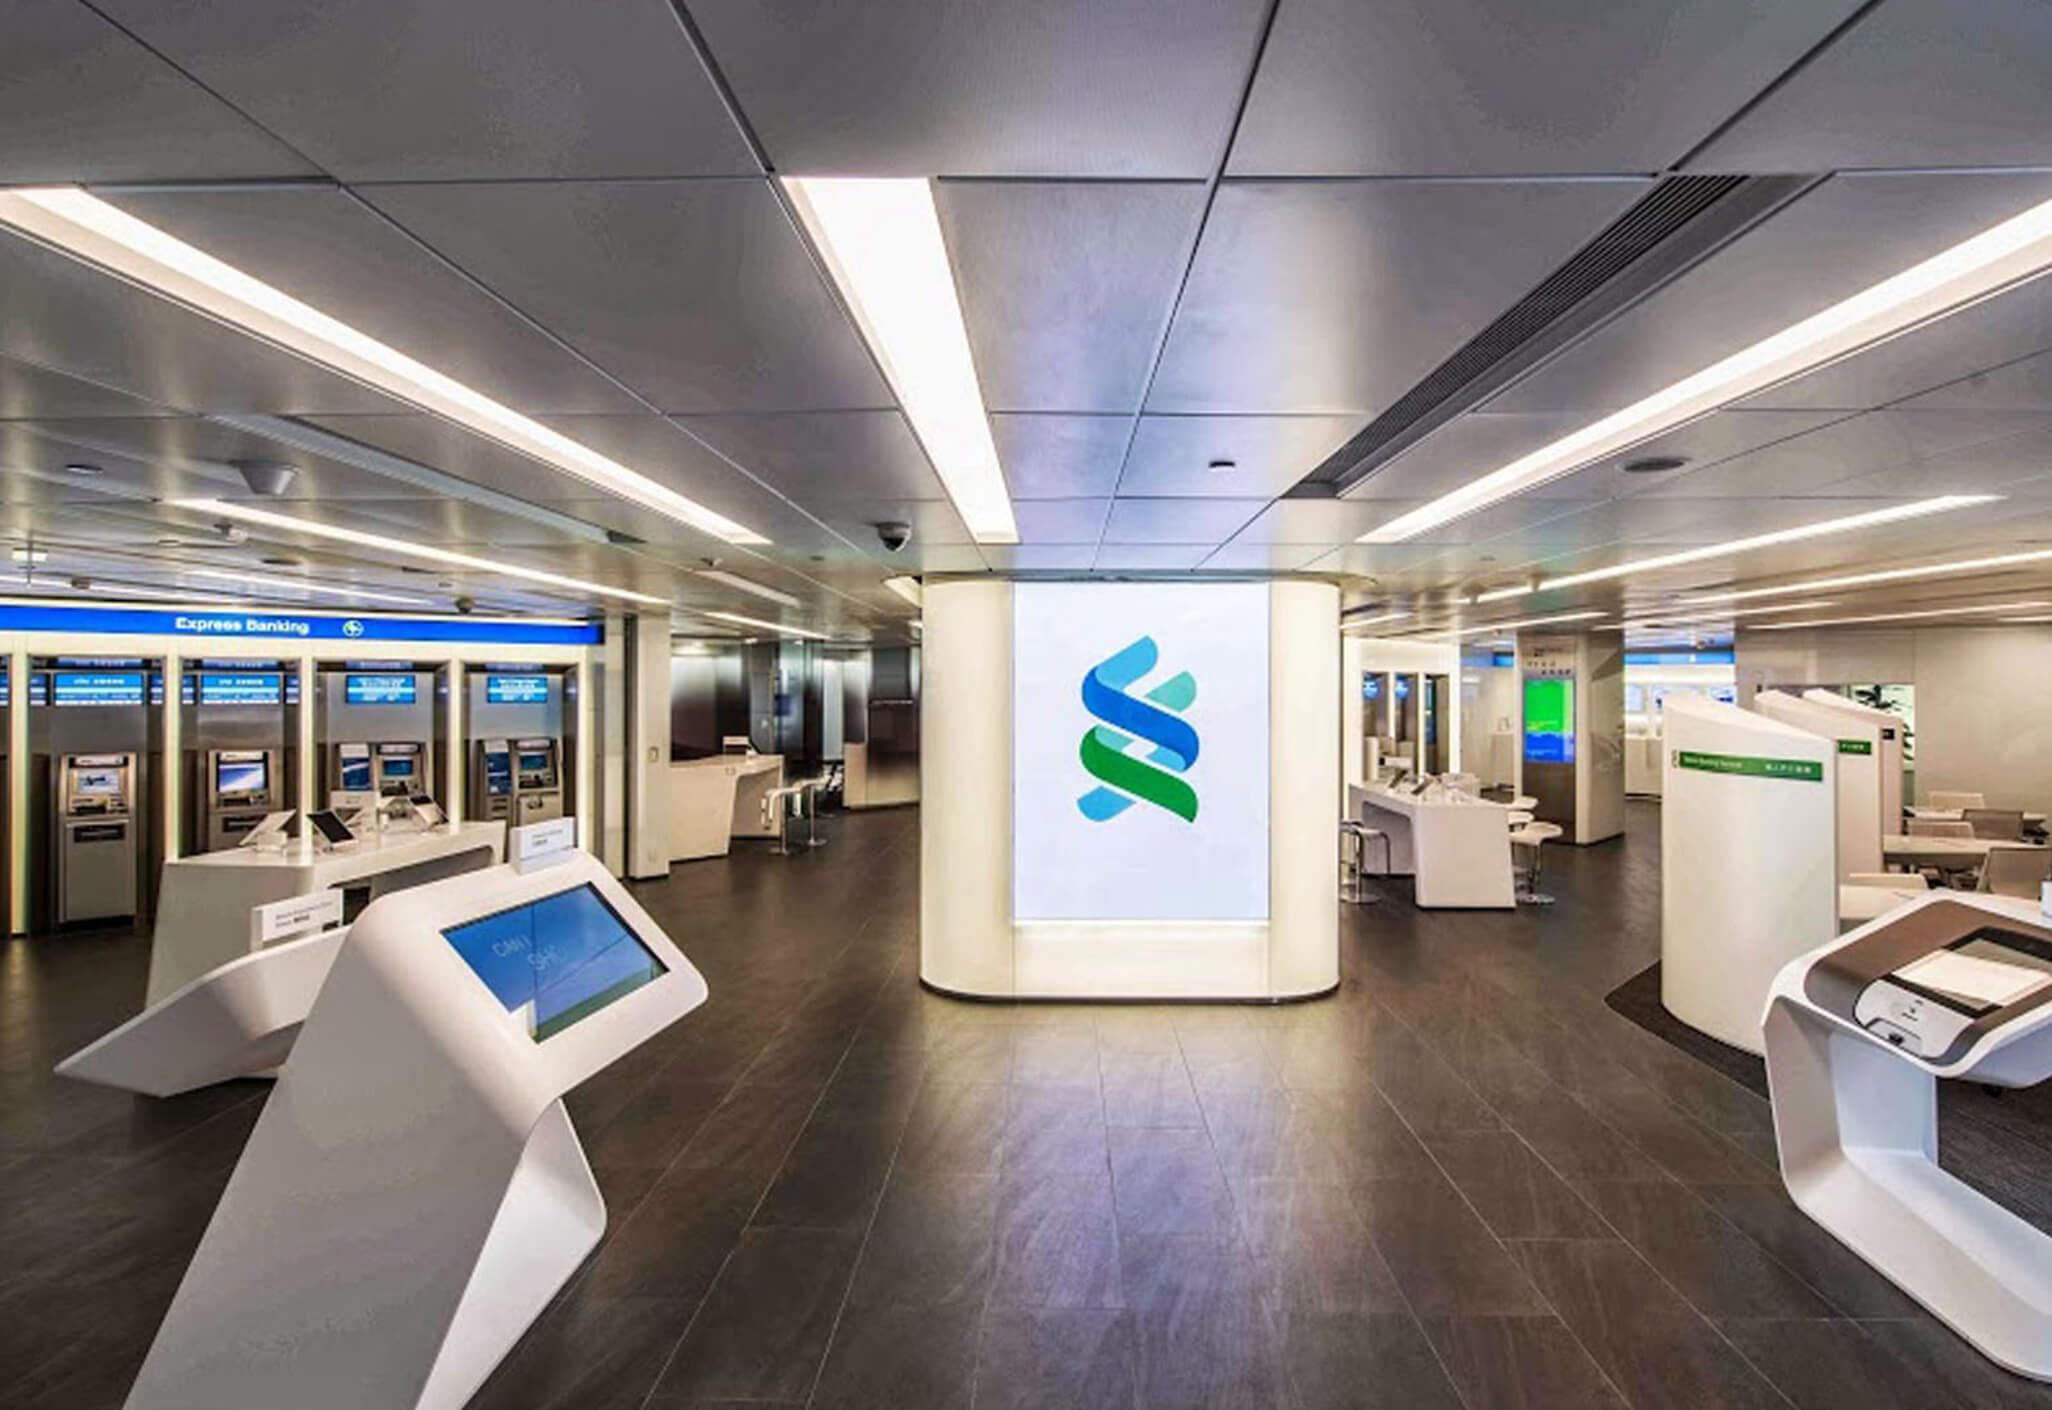 Standard Chartered Bank Des Voeux Road Retail Branch